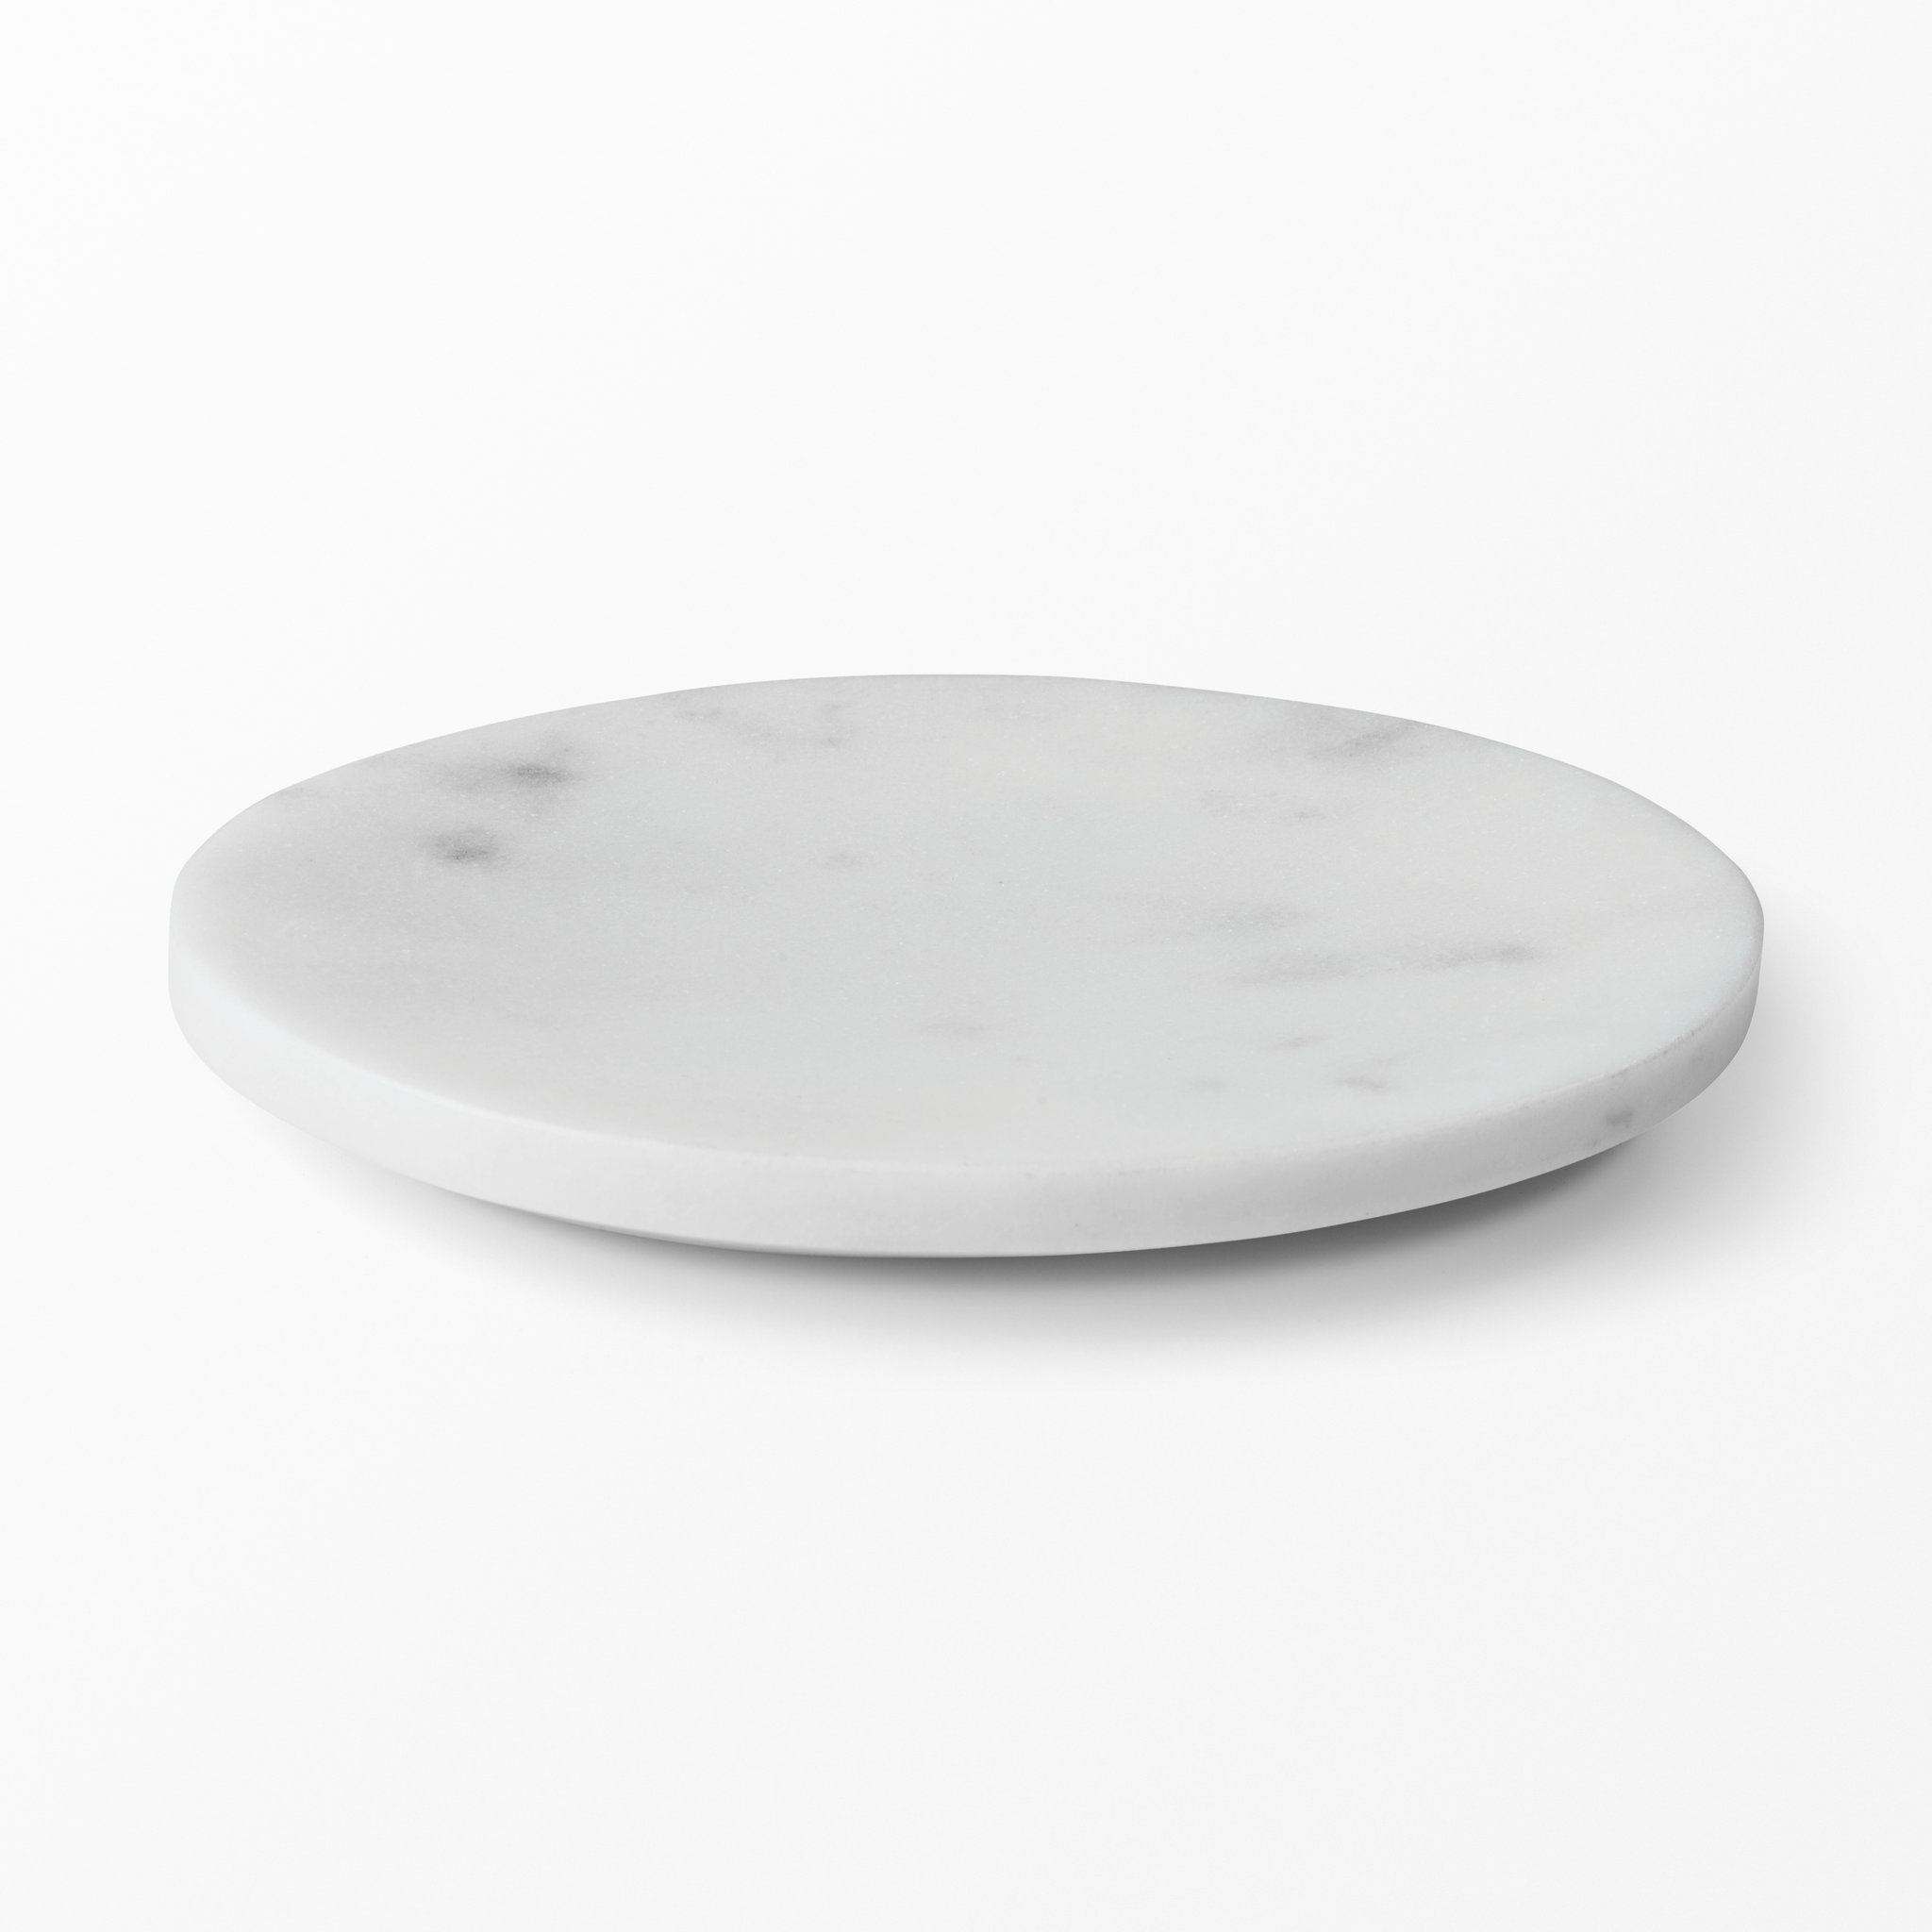 Tvålkopp i marmor   badrumsaccessoarer  köp online på åhlens.se!